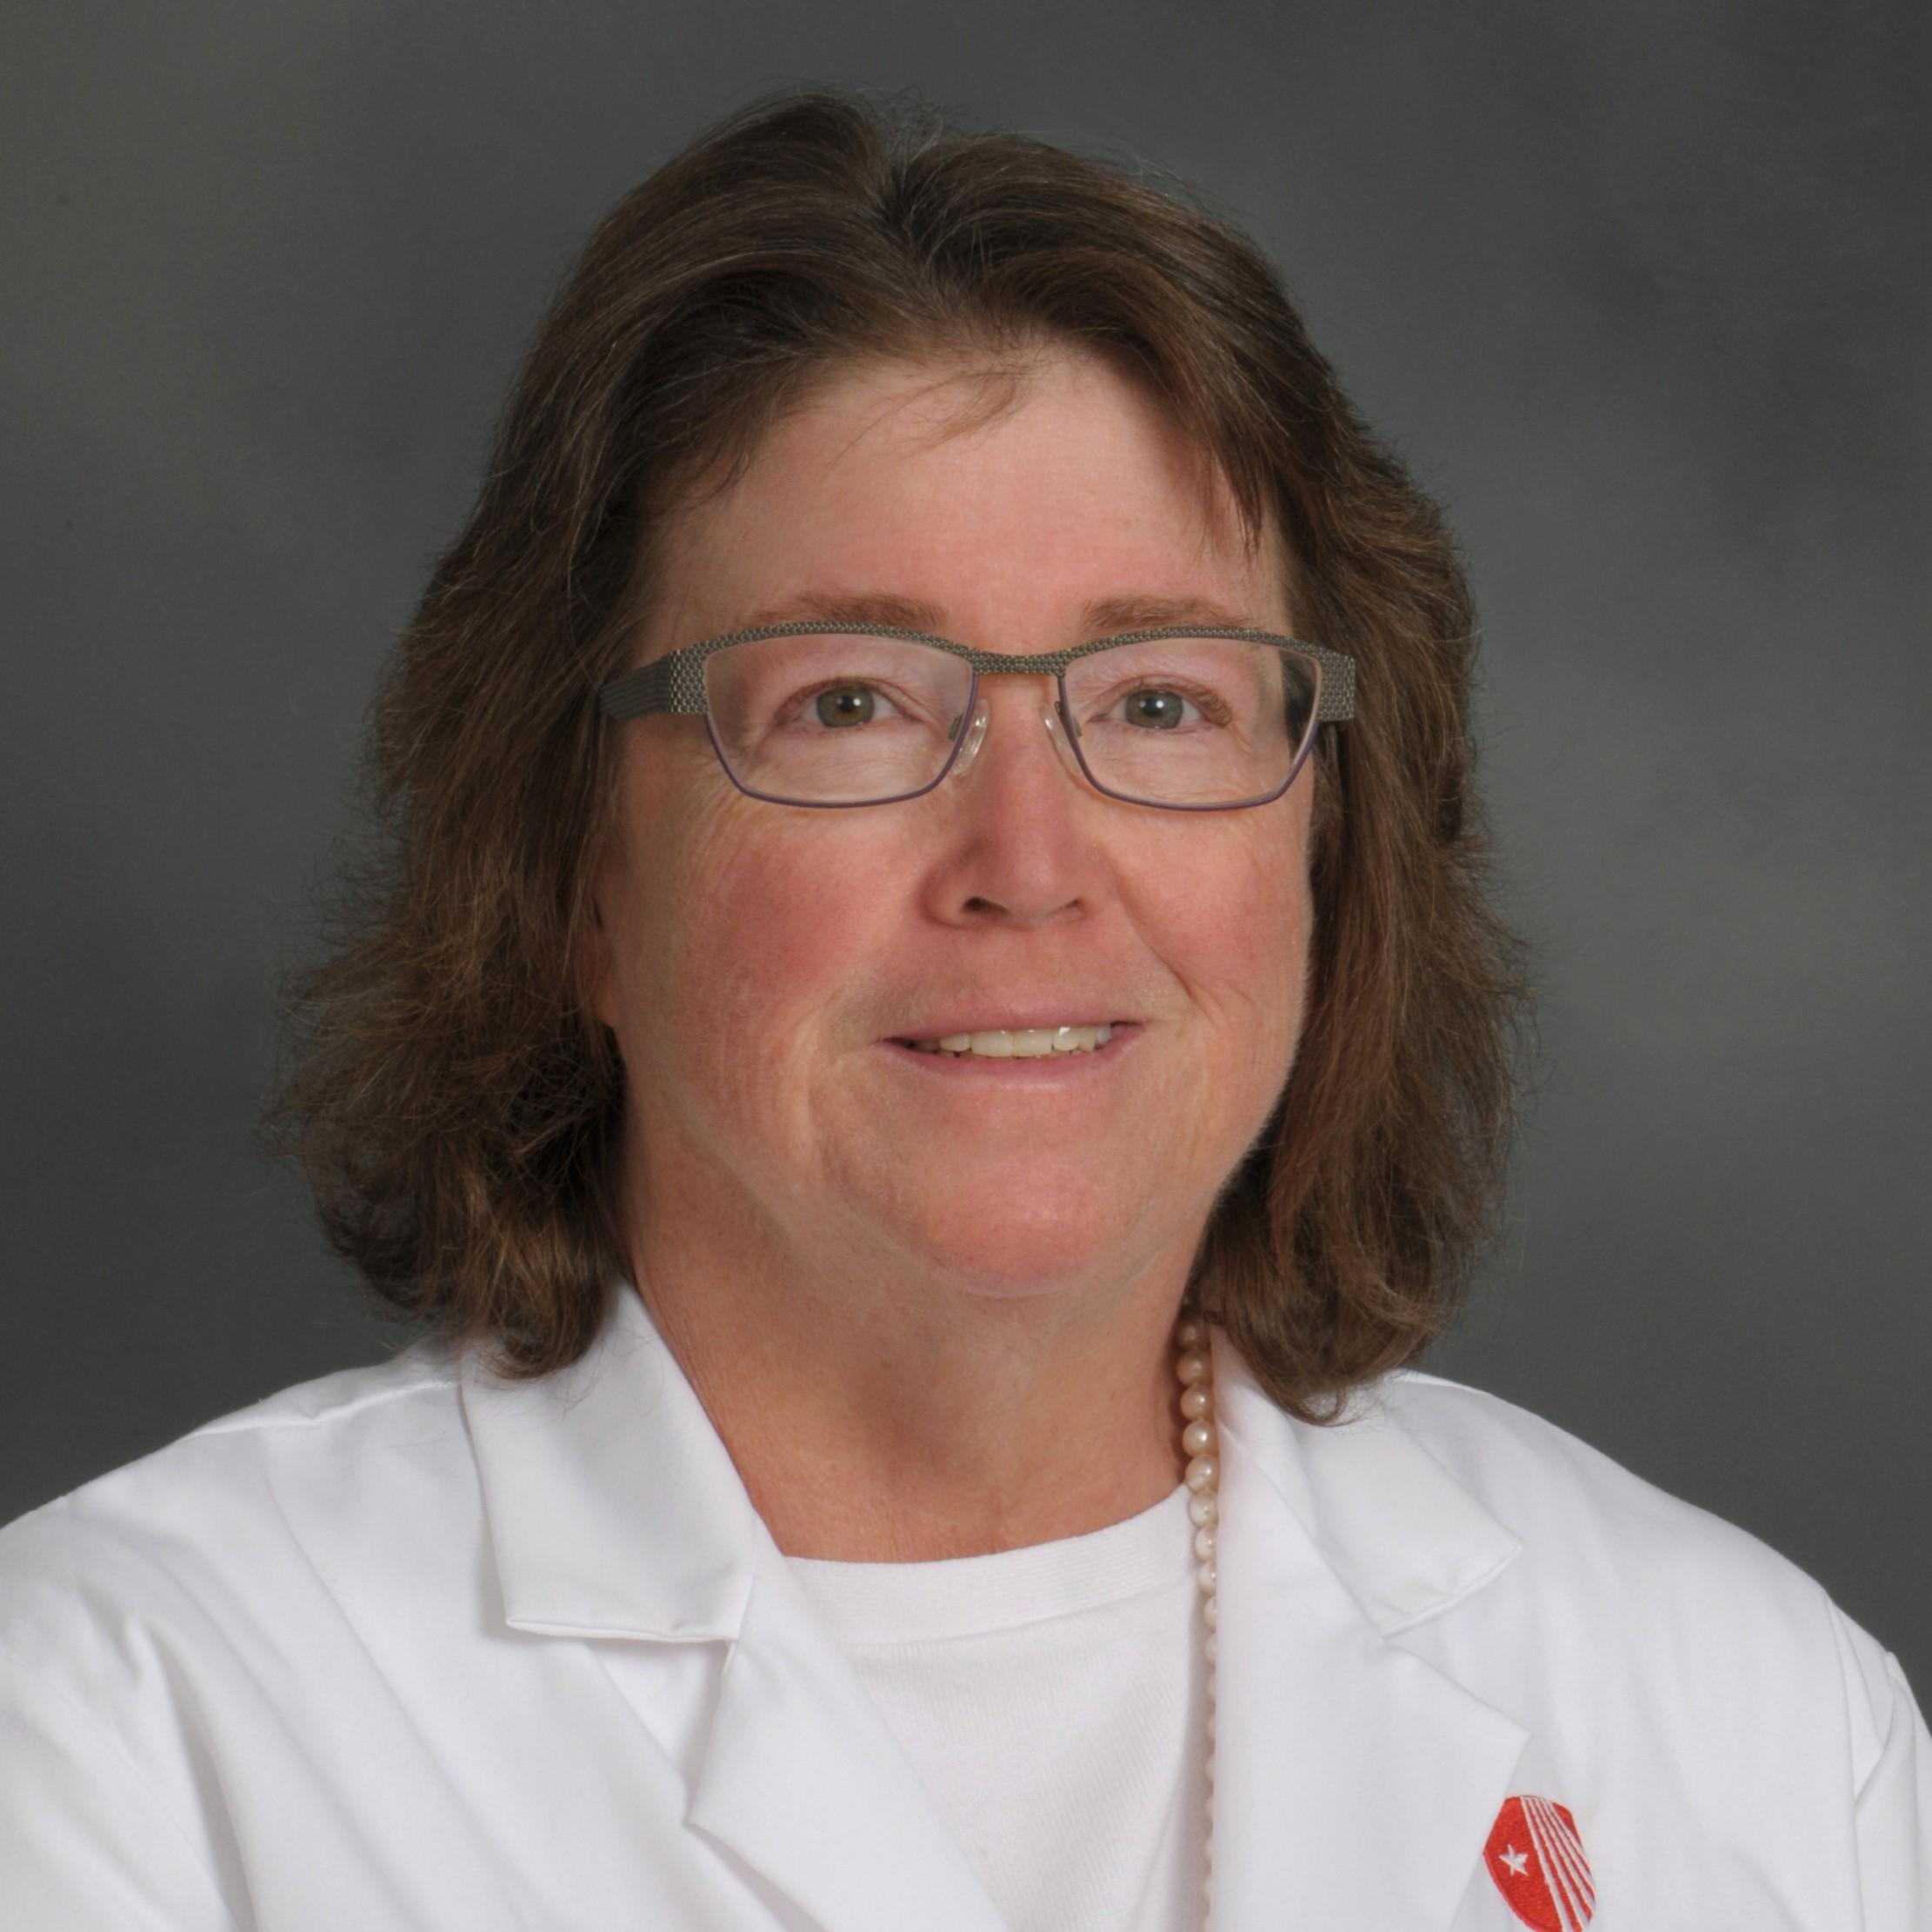 Margaret M. McGovern, MD, PhD